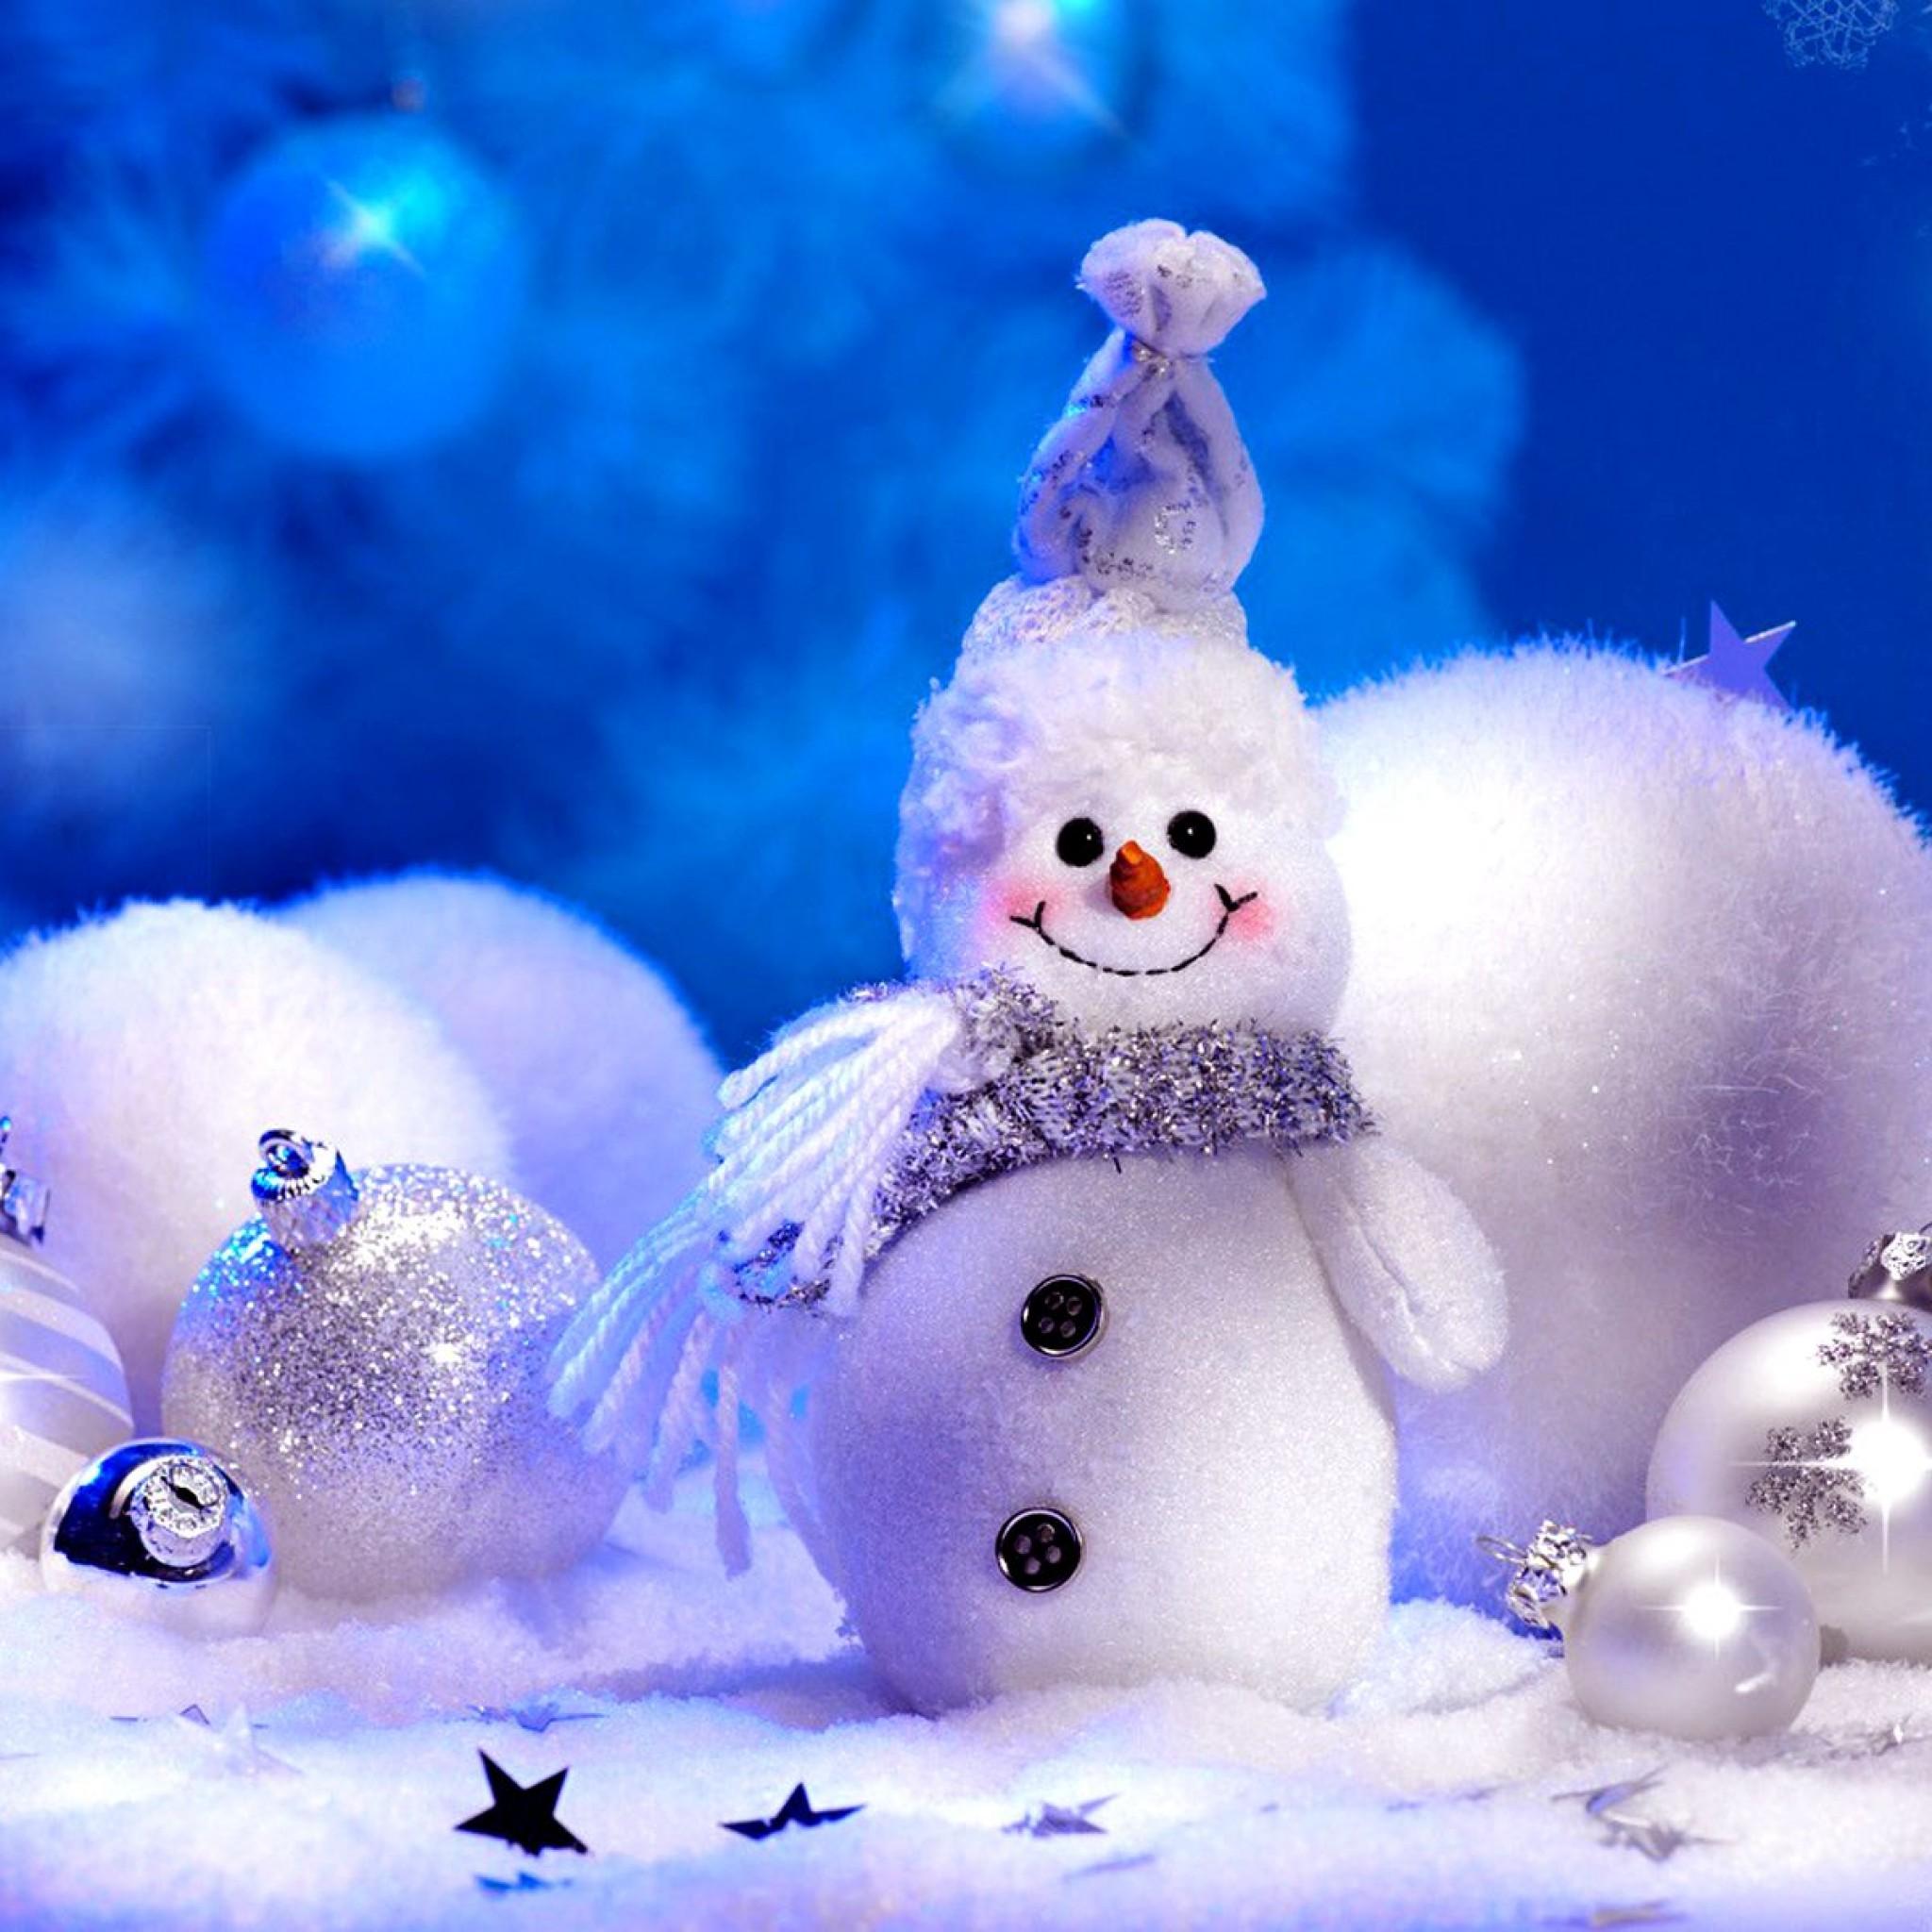 Ipad Air Christmas Wallpaper Hd Wallpapers Download 2048x2048